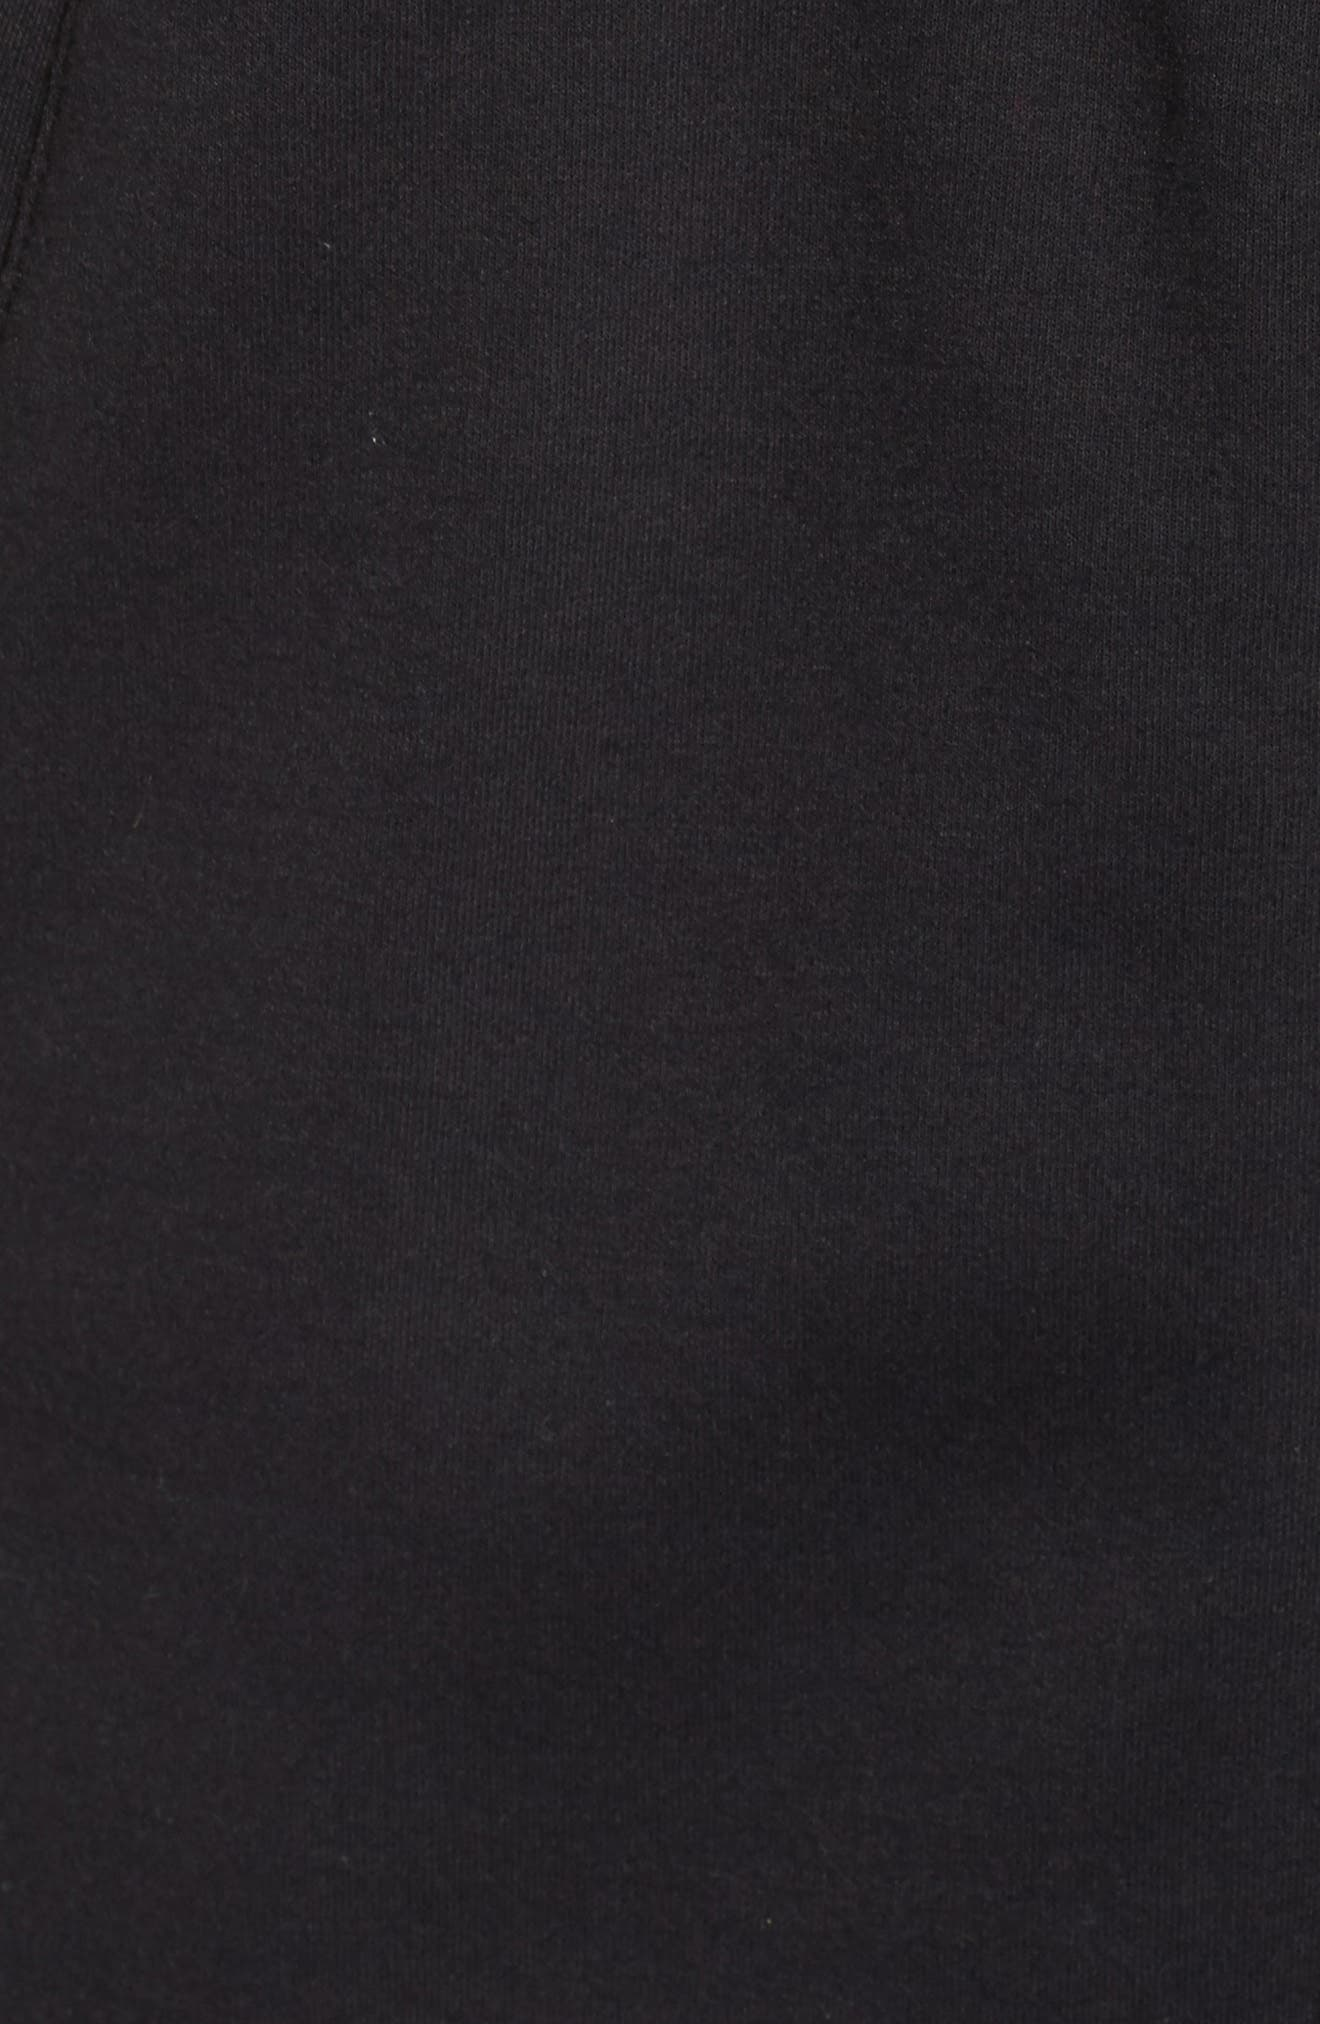 Slacker Hooded Jacket,                             Alternate thumbnail 6, color,                             Tnf Black